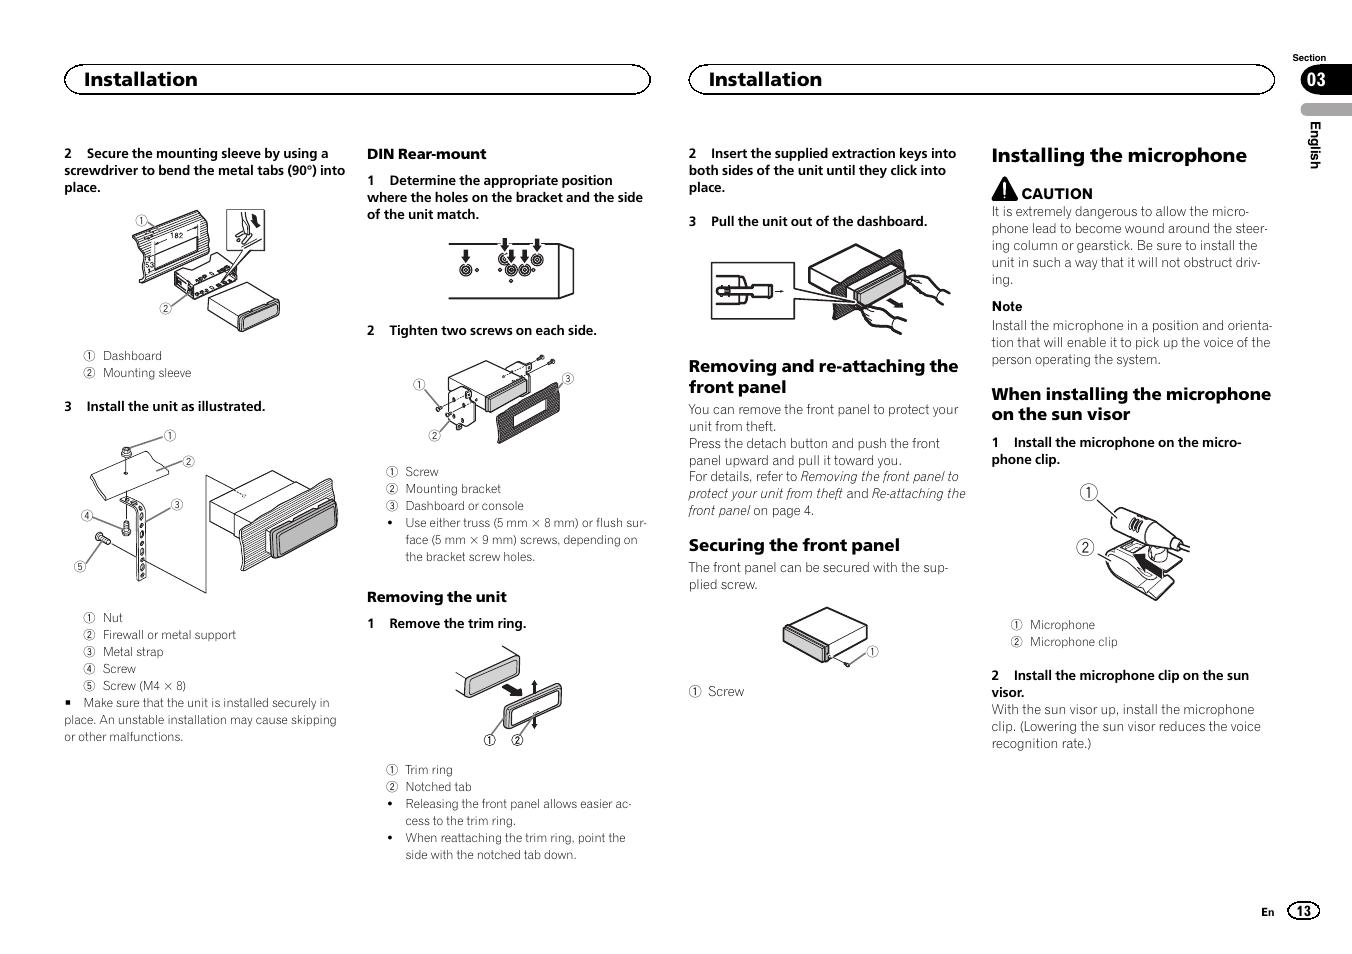 Fein 3 Wege Wandschalterverkabelung Bilder - Der Schaltplan ...